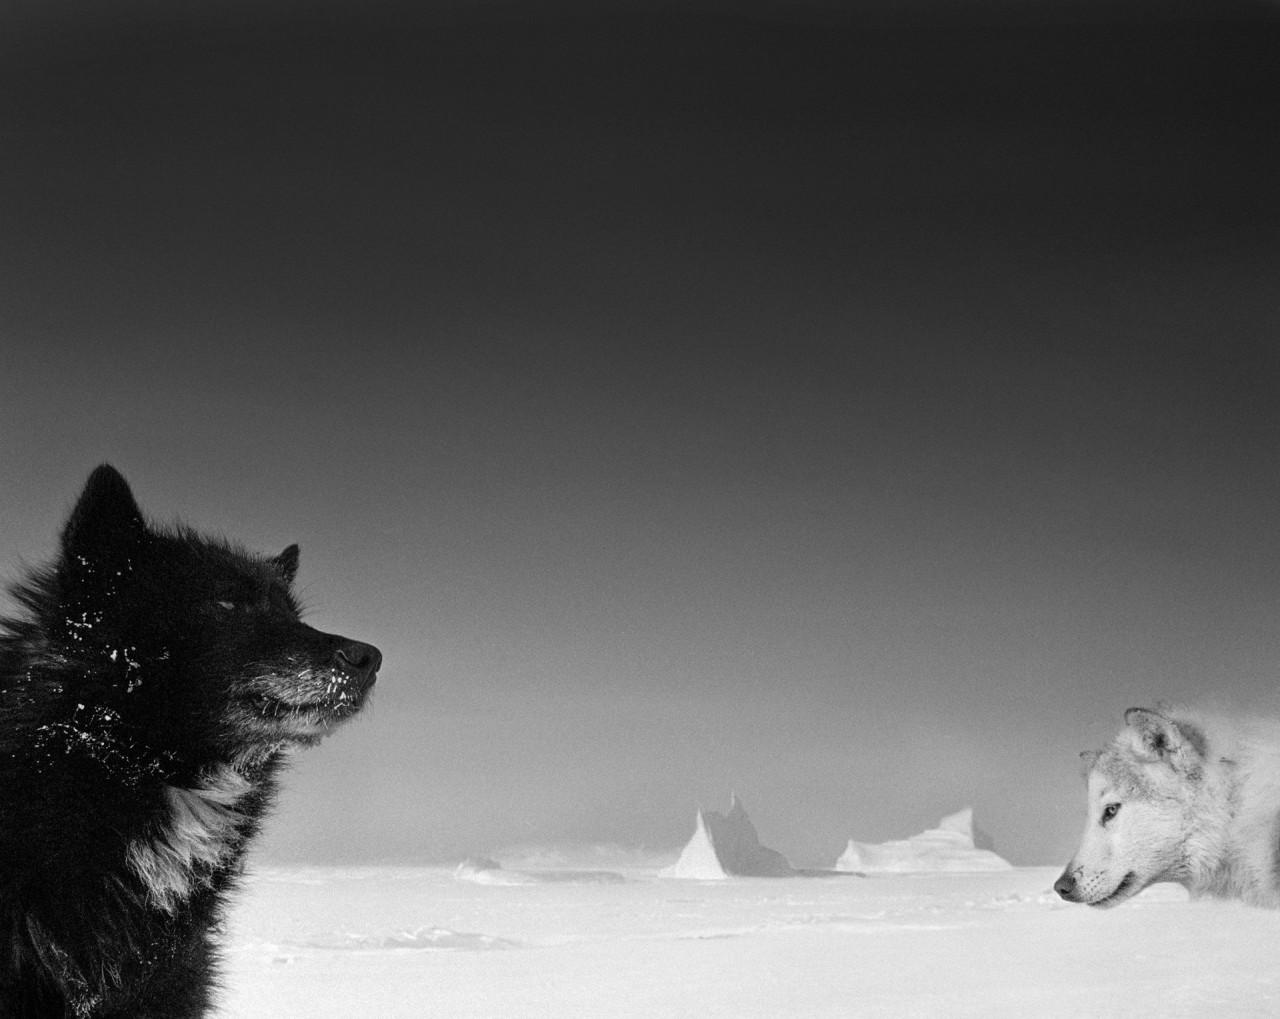 Последние дни Арктики. Фотограф Рагнар Аксельссон